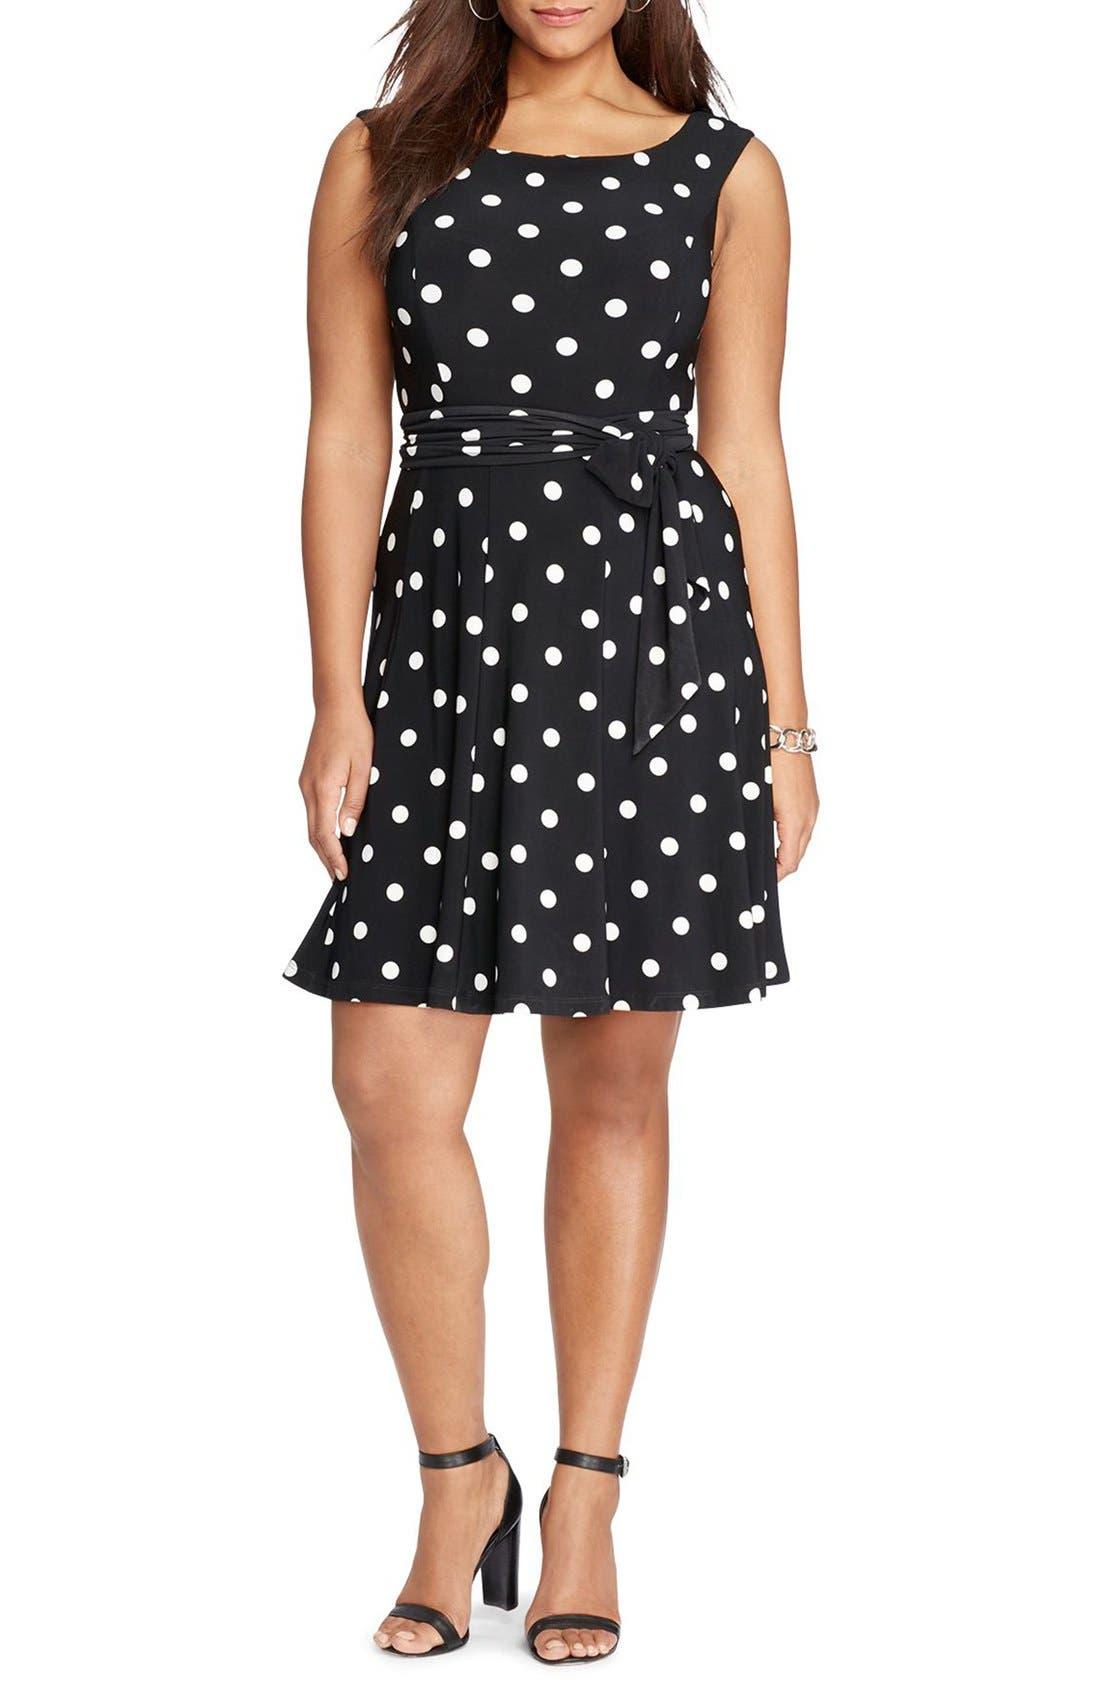 Alternate Image 1 Selected - Lauren Ralph Lauren Dot Fit & Flare Dress (Plus Size)